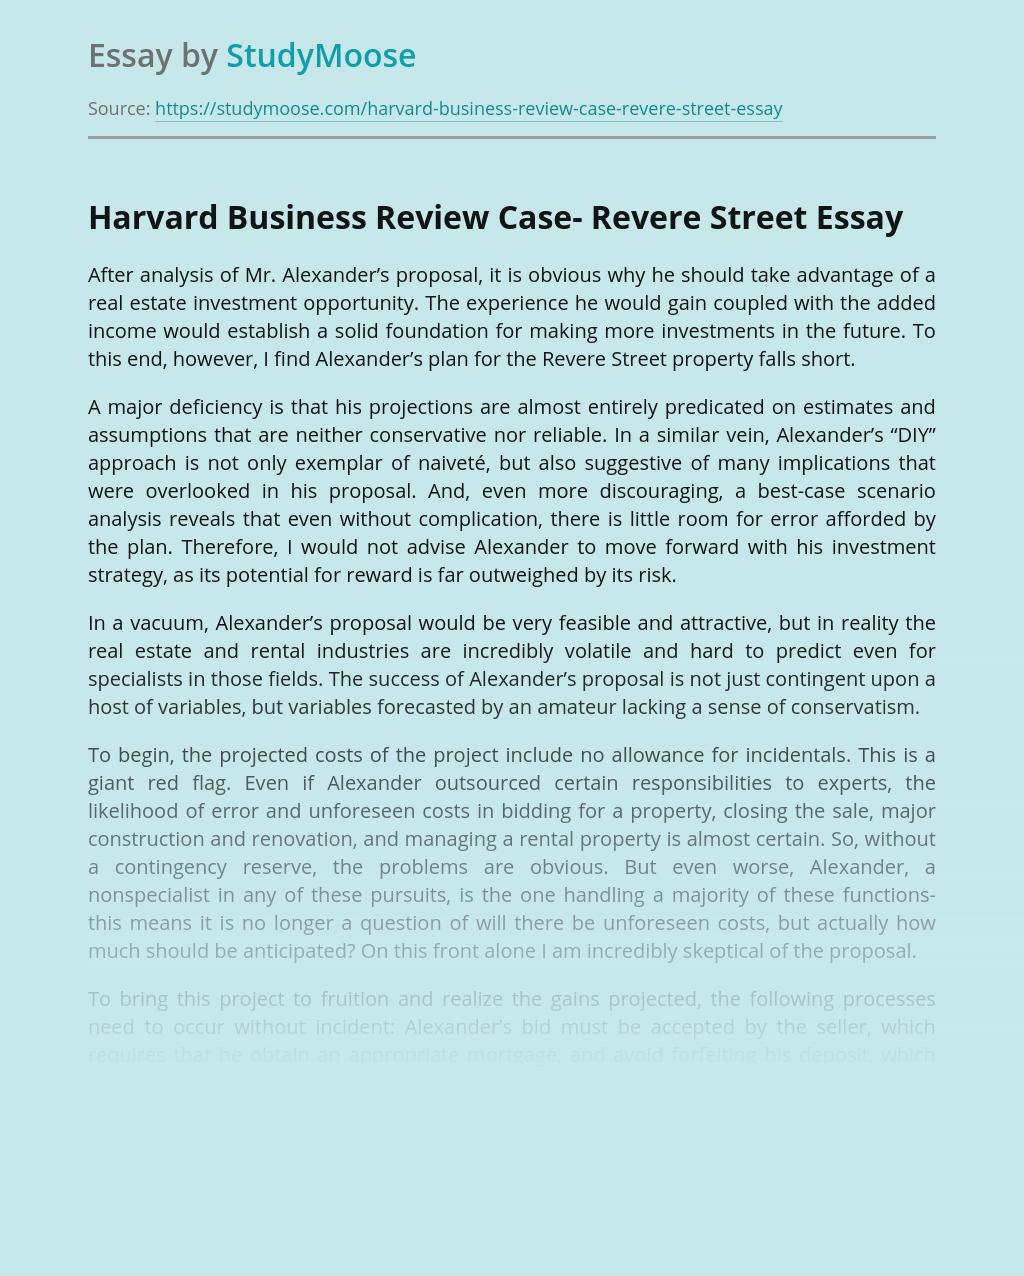 Harvard Business Review Case- Revere Street